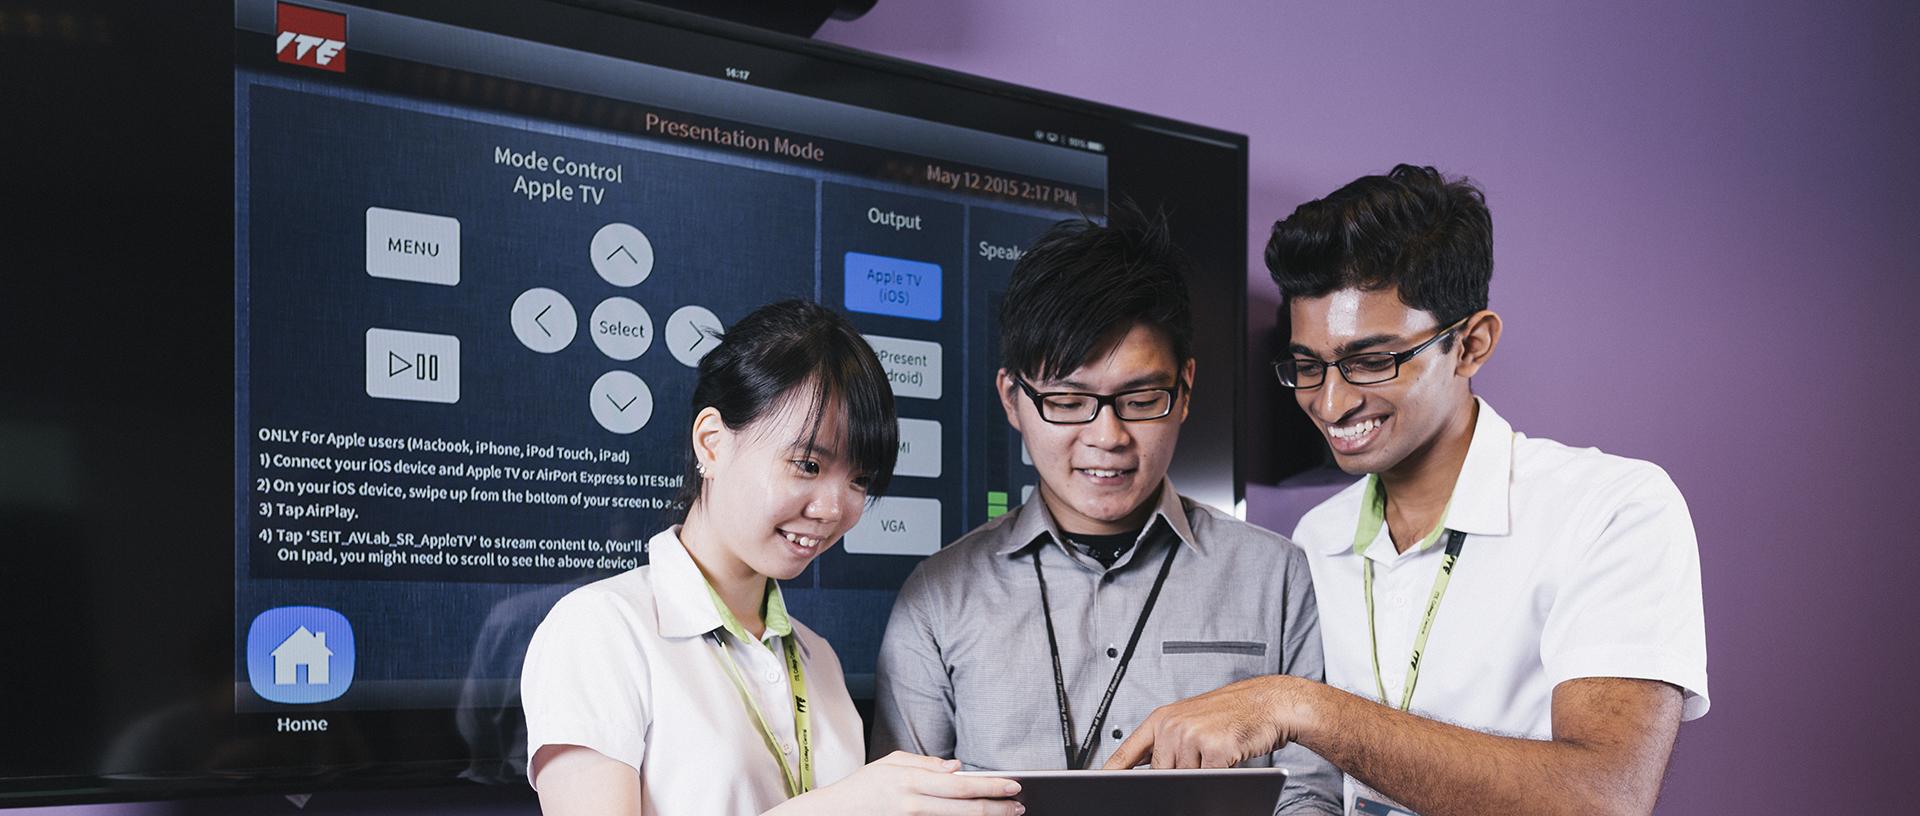 Higher-Nitec-in-Electronics-Engineering